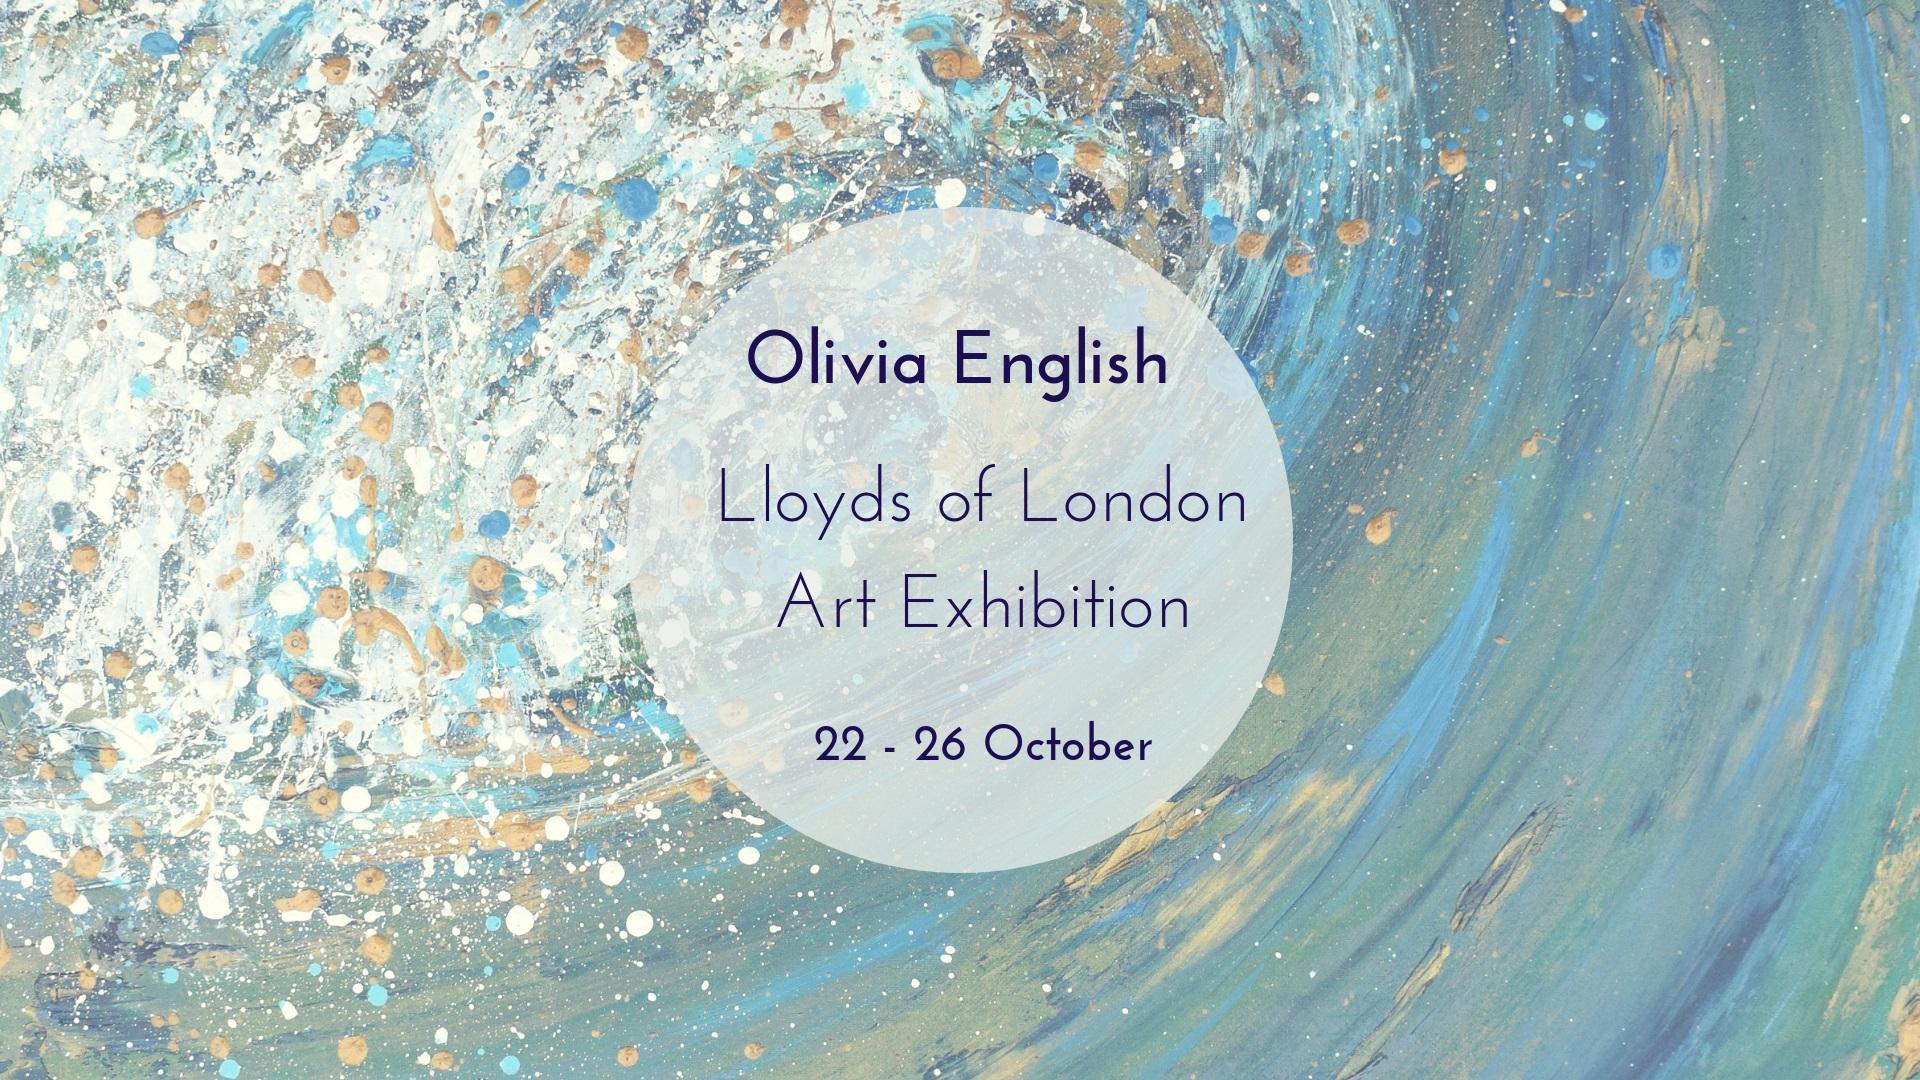 Olivia English